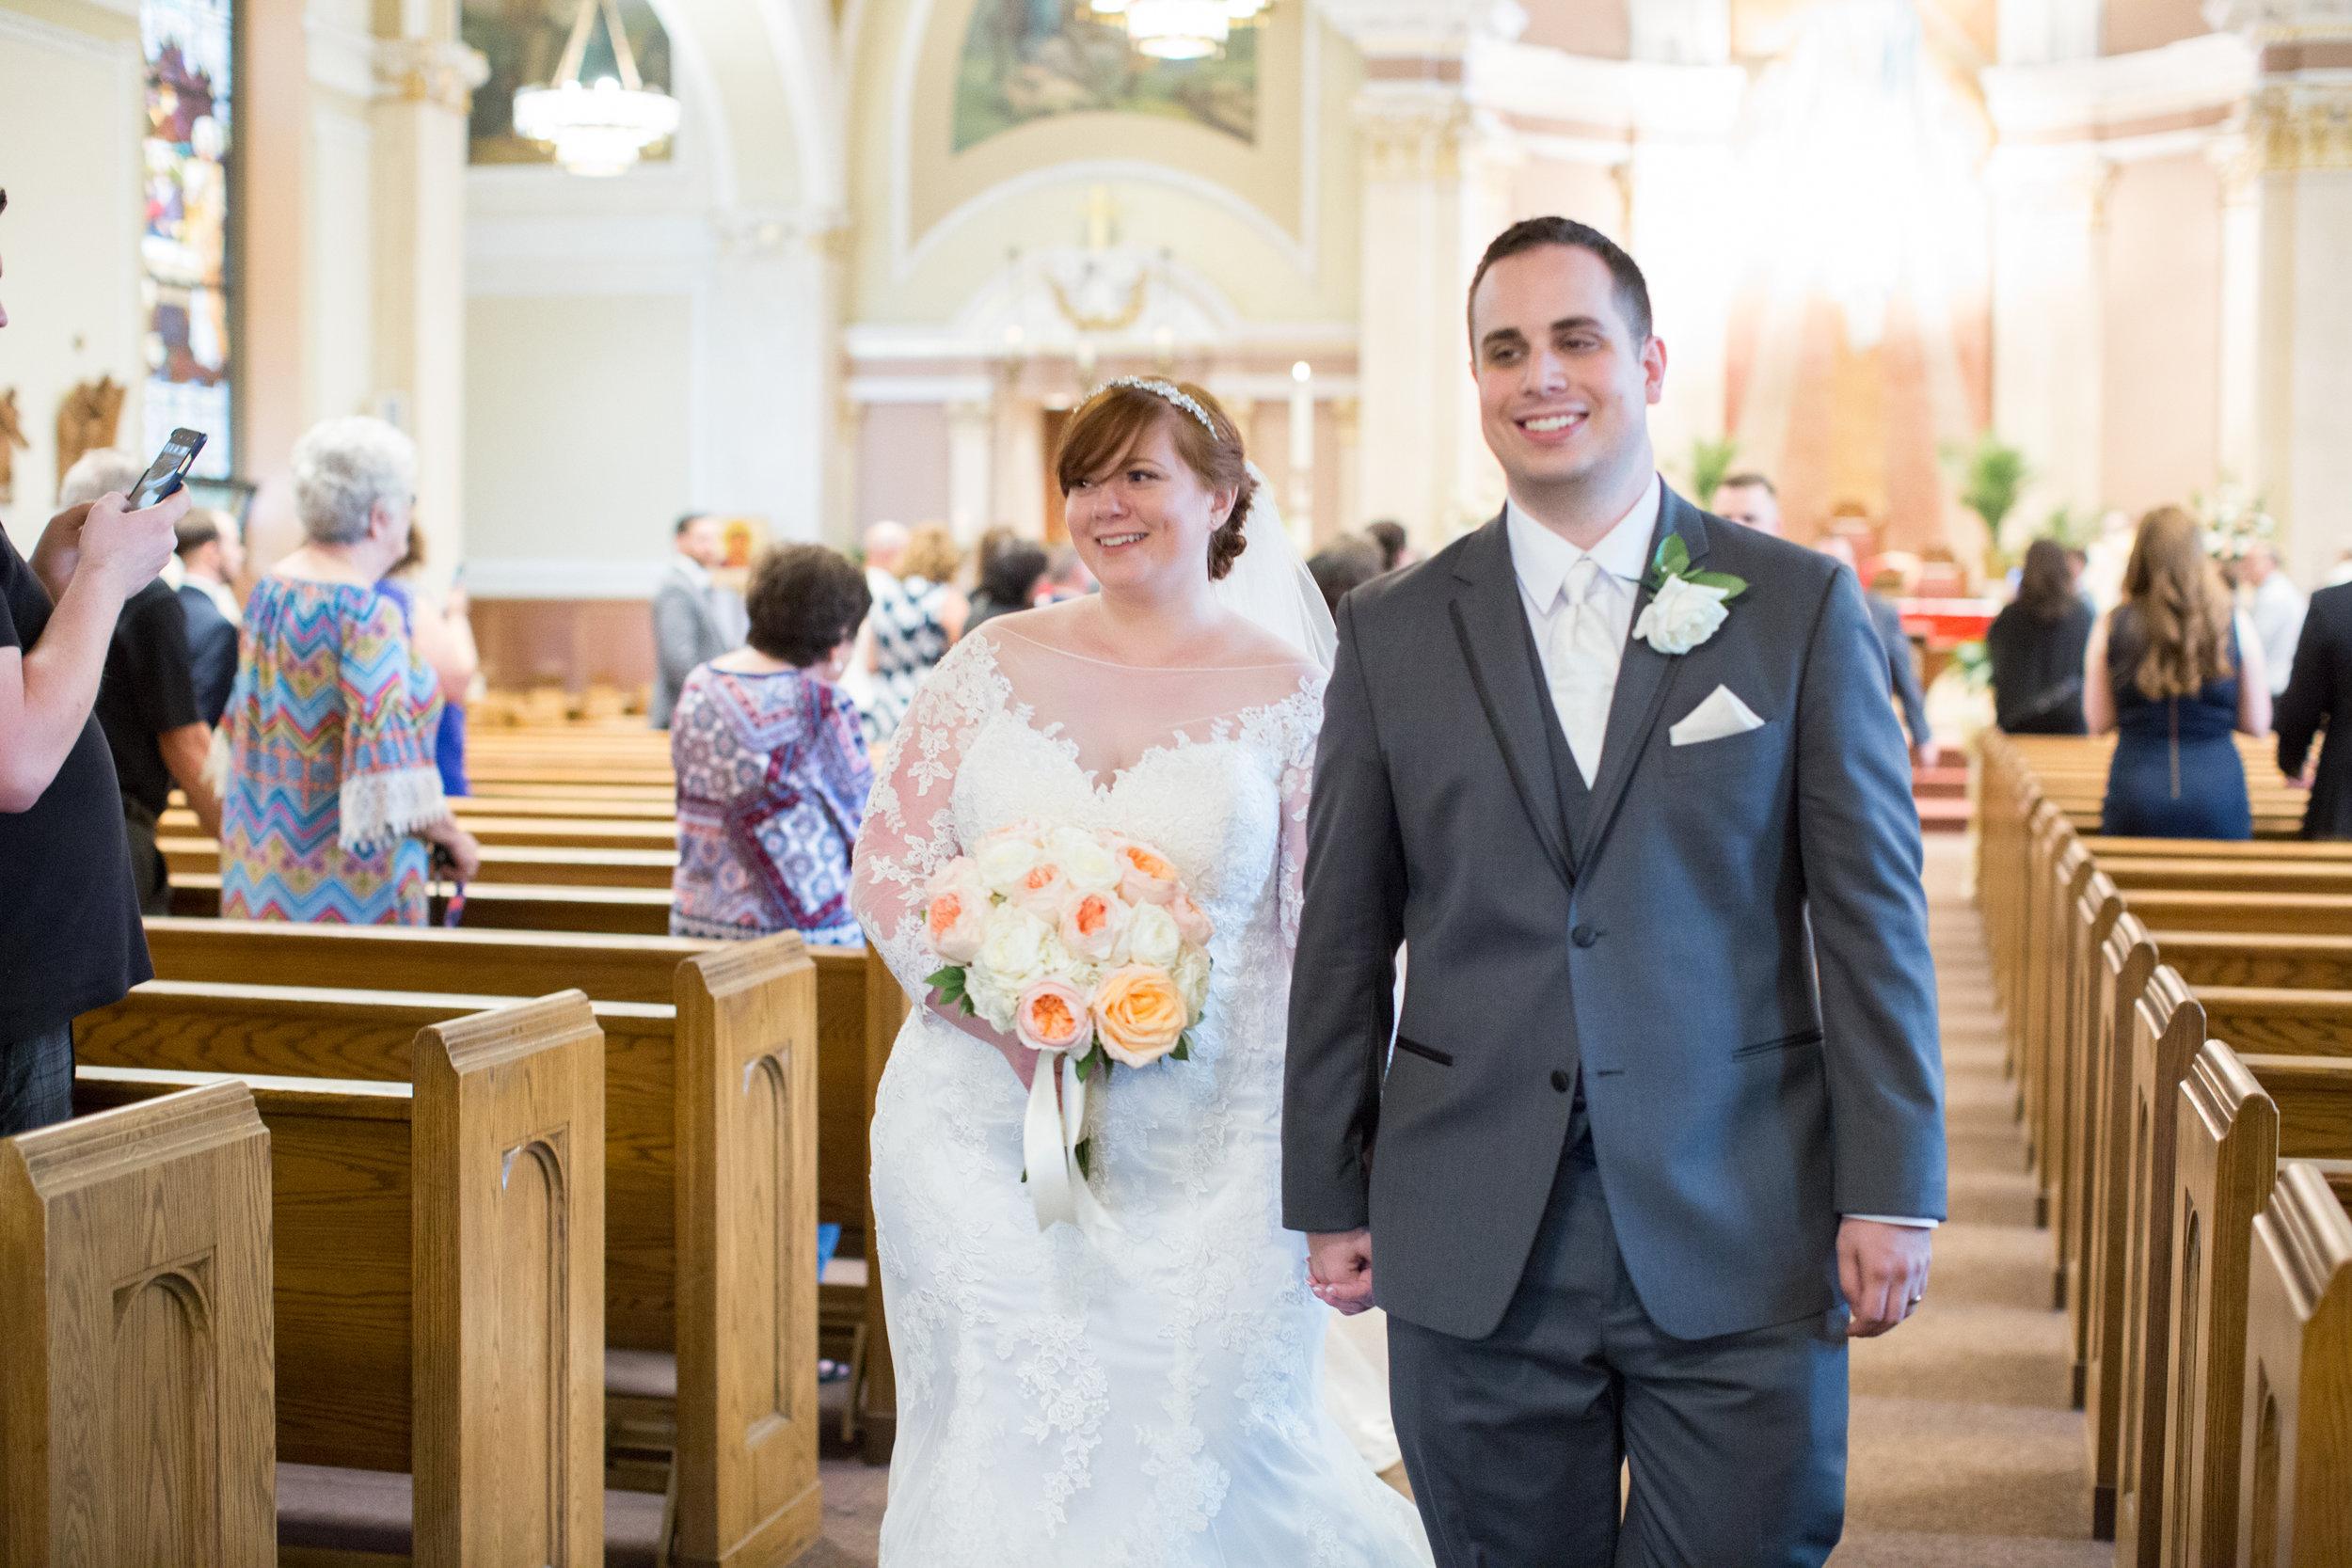 Fiorellis Wedding Photos_JDP-54.jpg